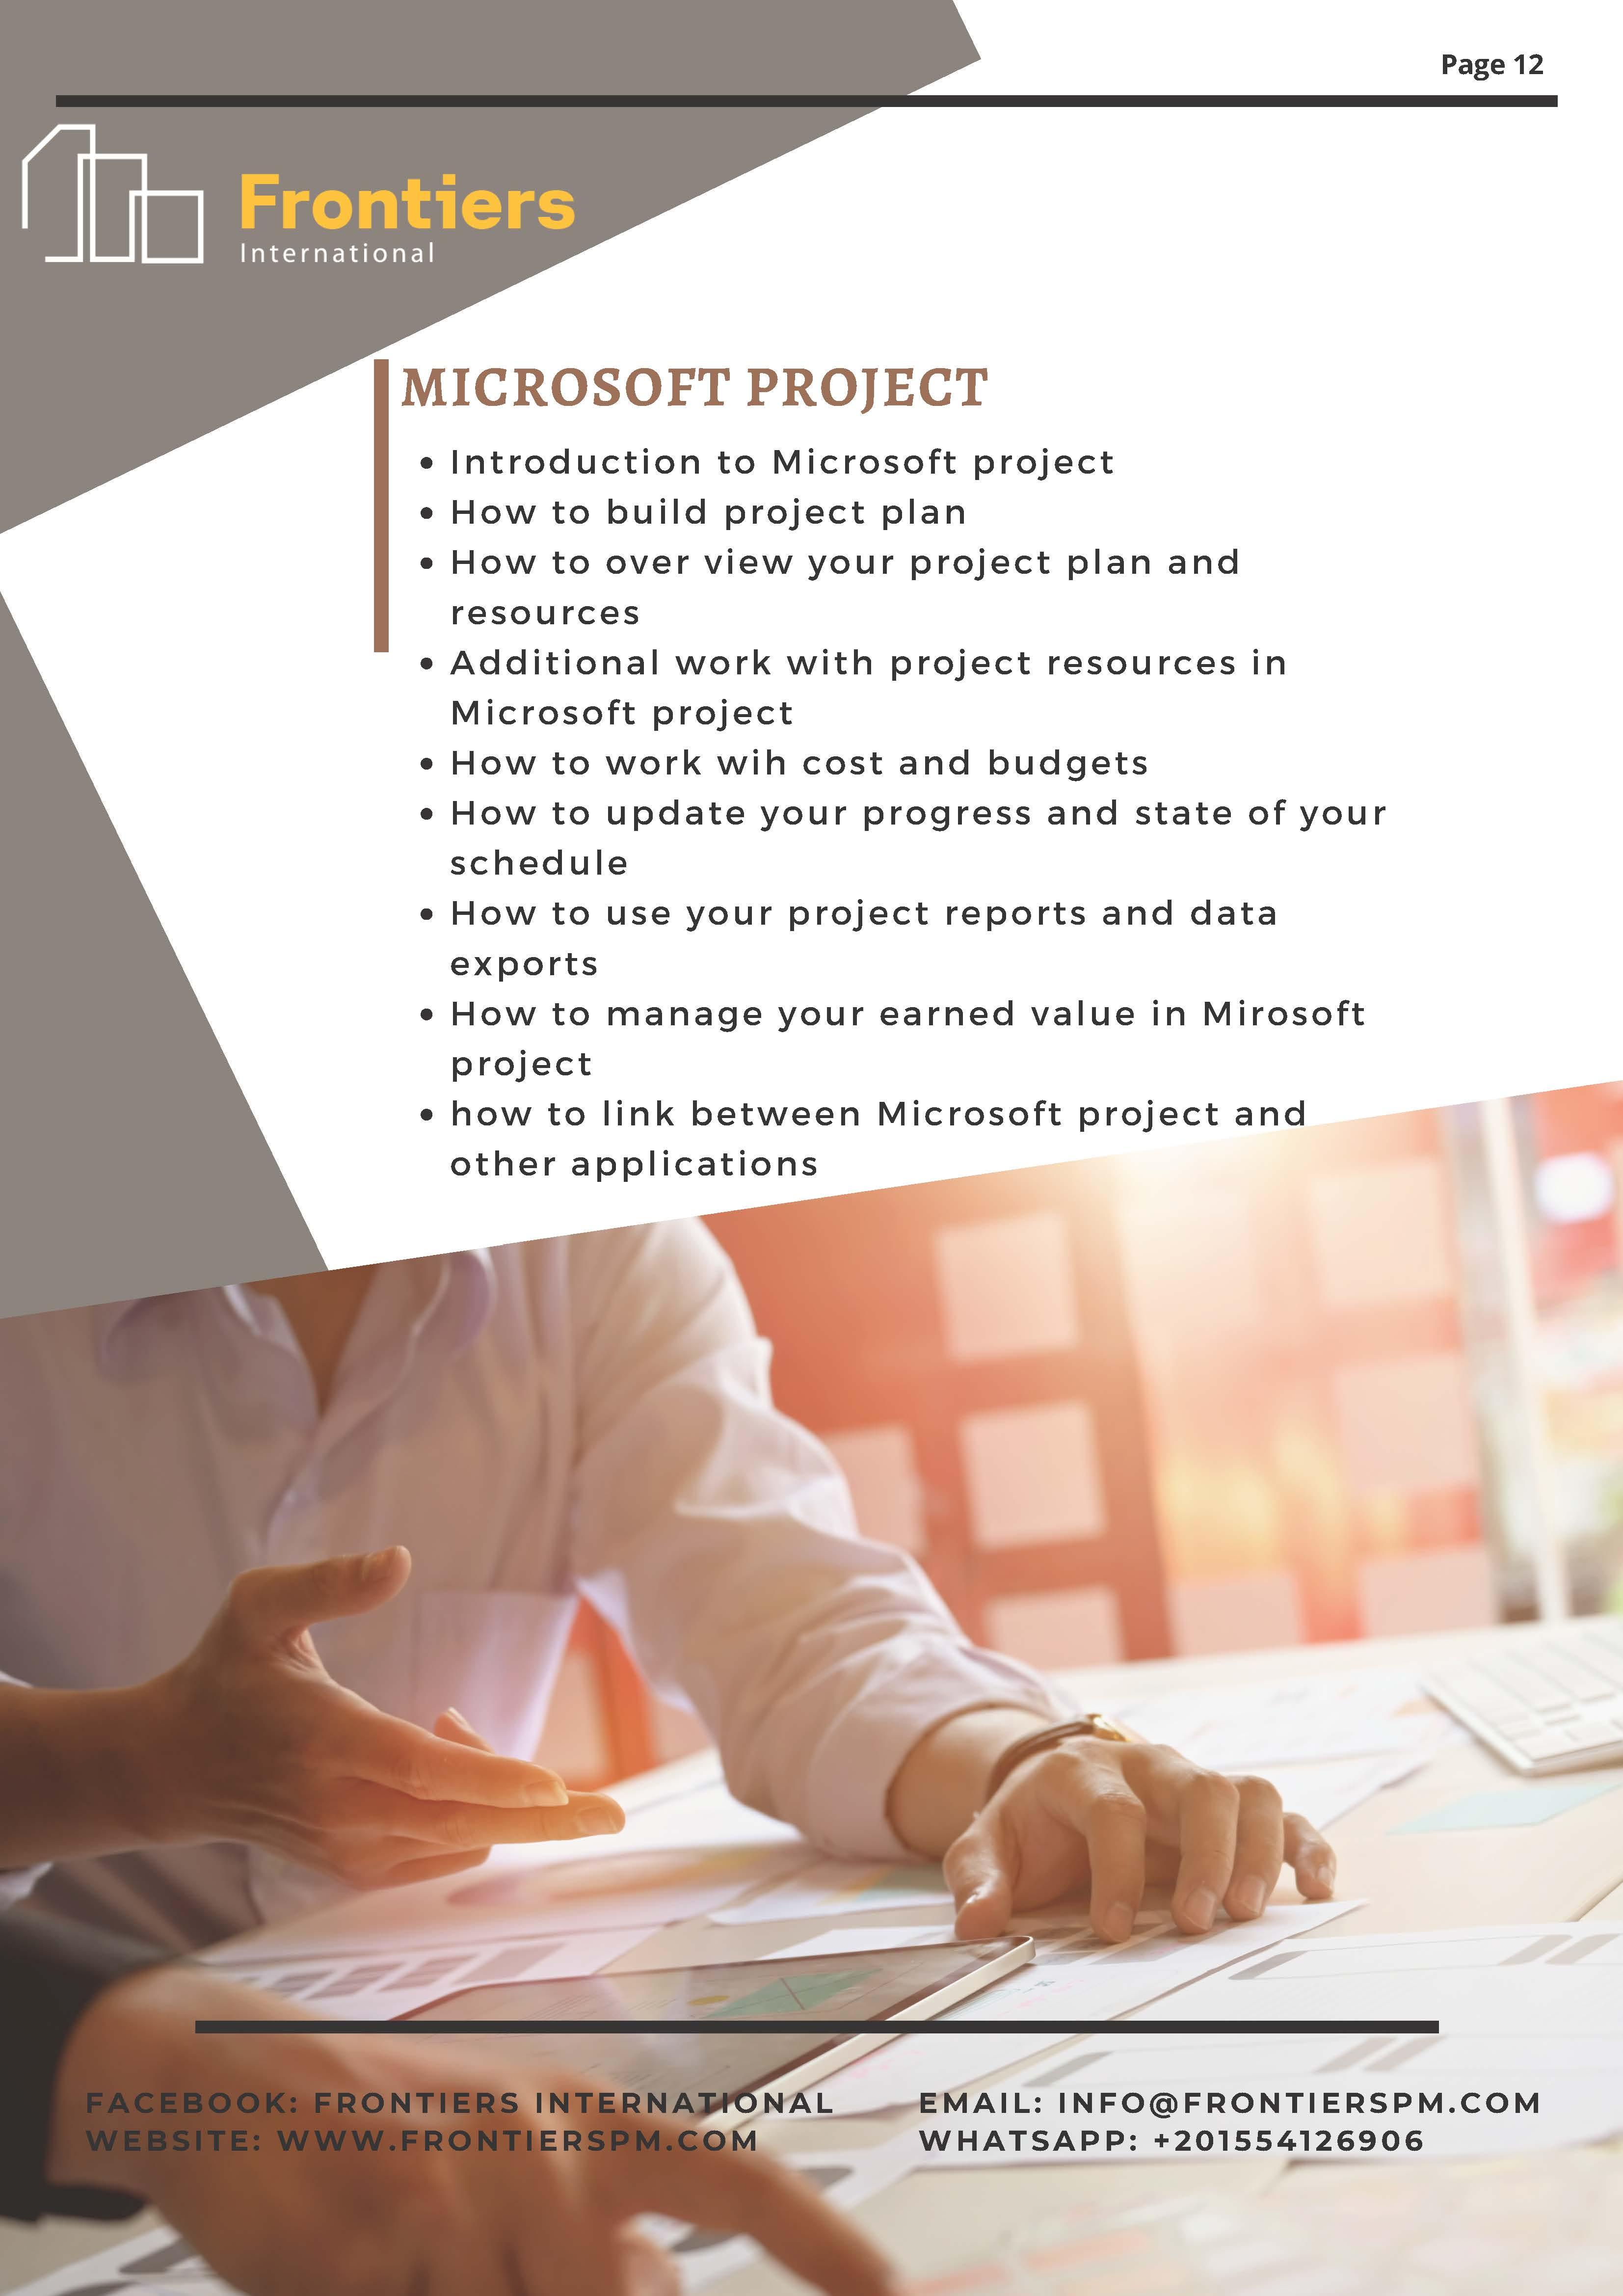 Micrososoft Project